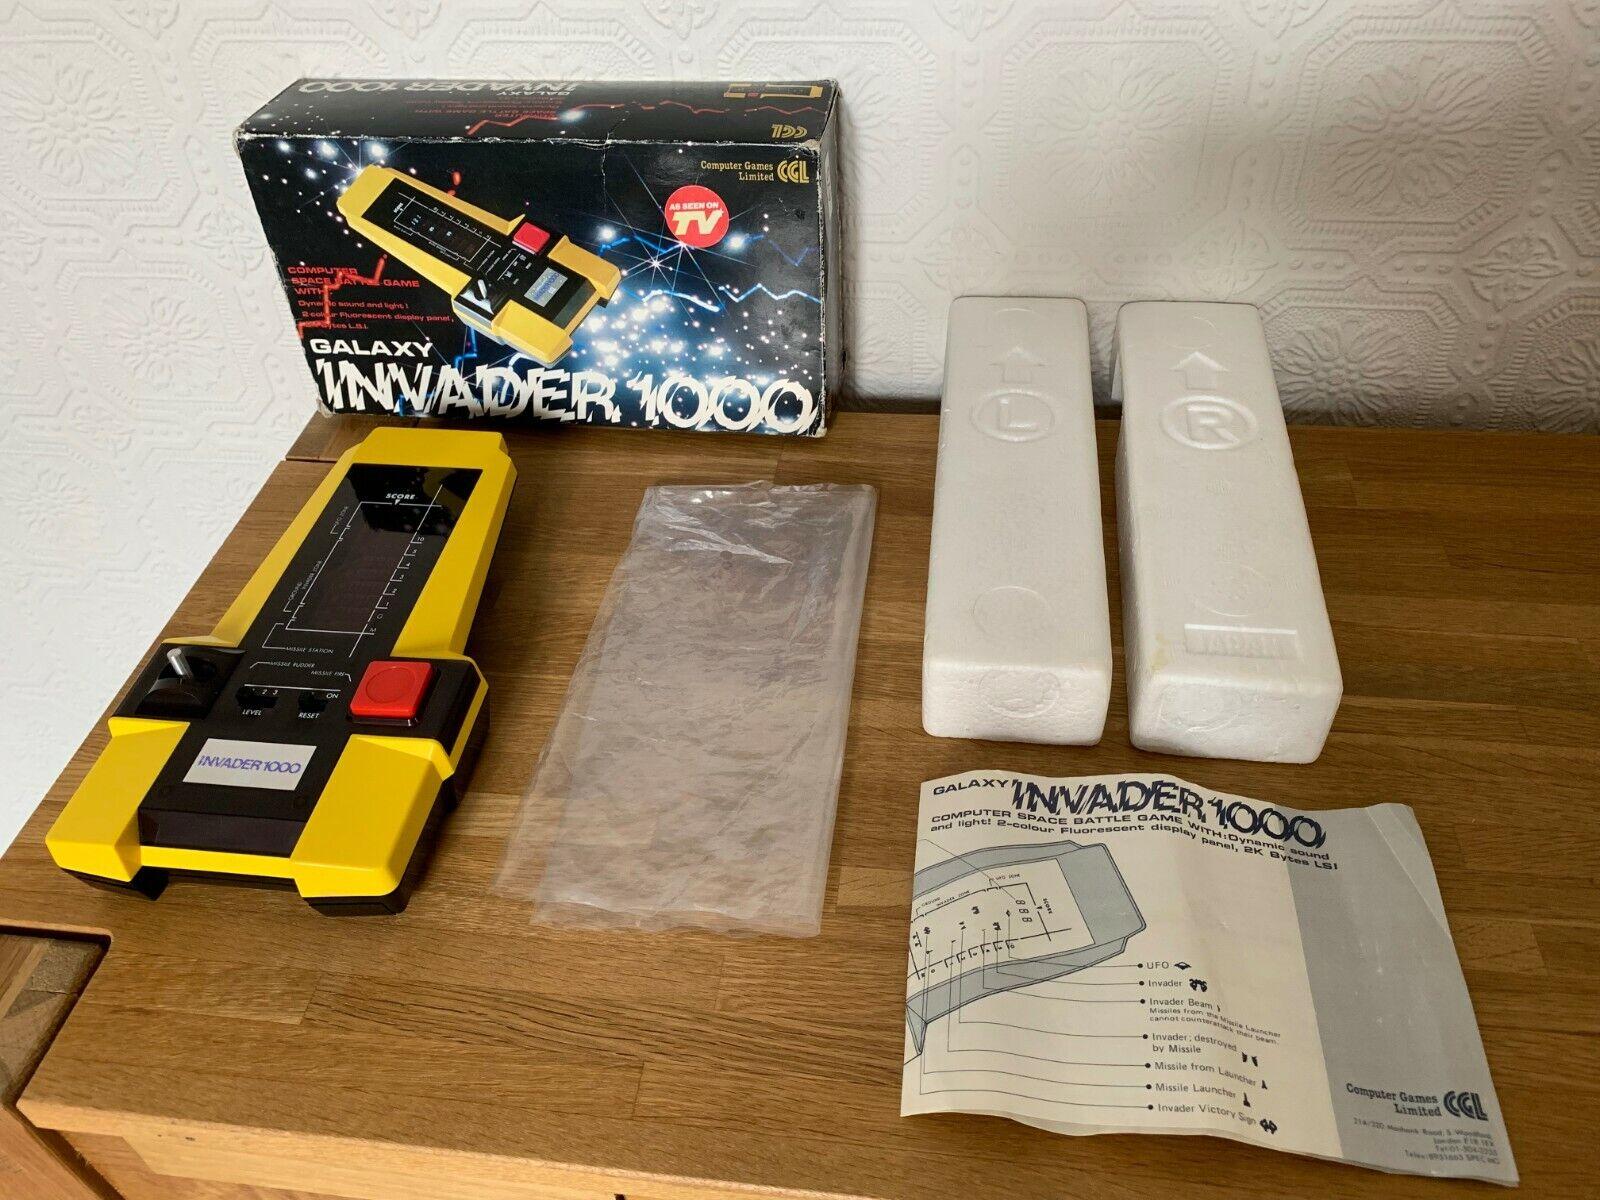 Mint Boxad CGL Galaxy Invader 1000 årgång 1980 Handhållen Electronic spel - A